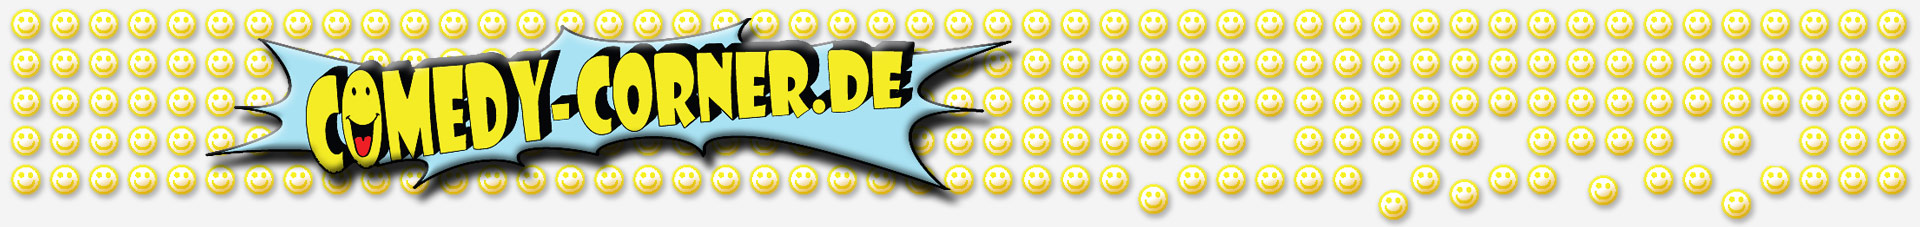 smilies_header-1100x227.jpg